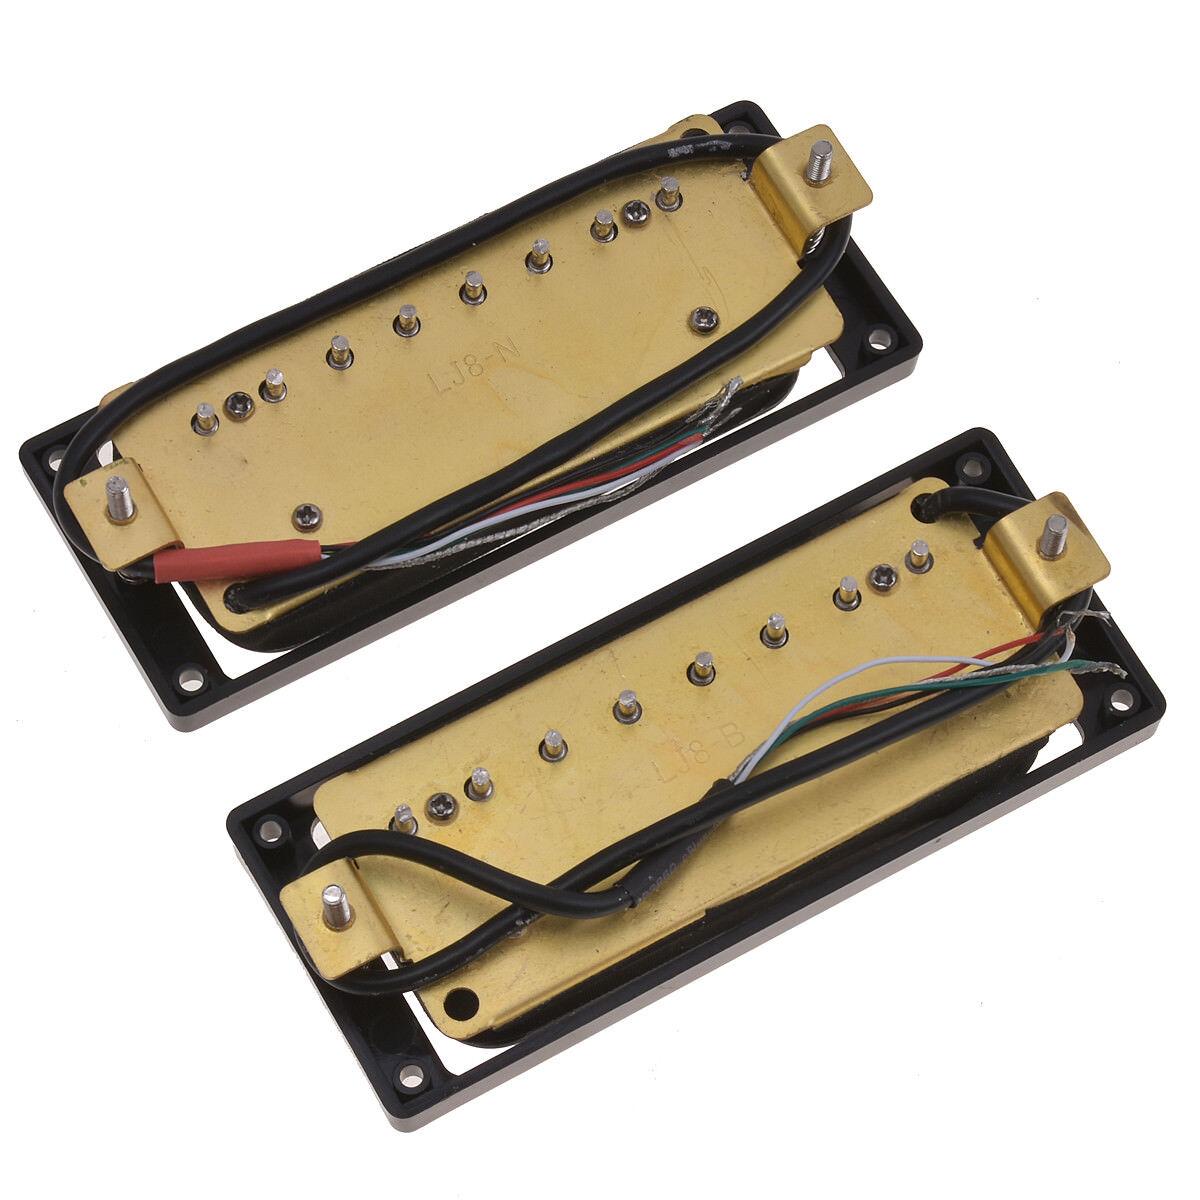 humbucker pickups set bridge and neck for 8 string electric guitar parts passive ebay. Black Bedroom Furniture Sets. Home Design Ideas